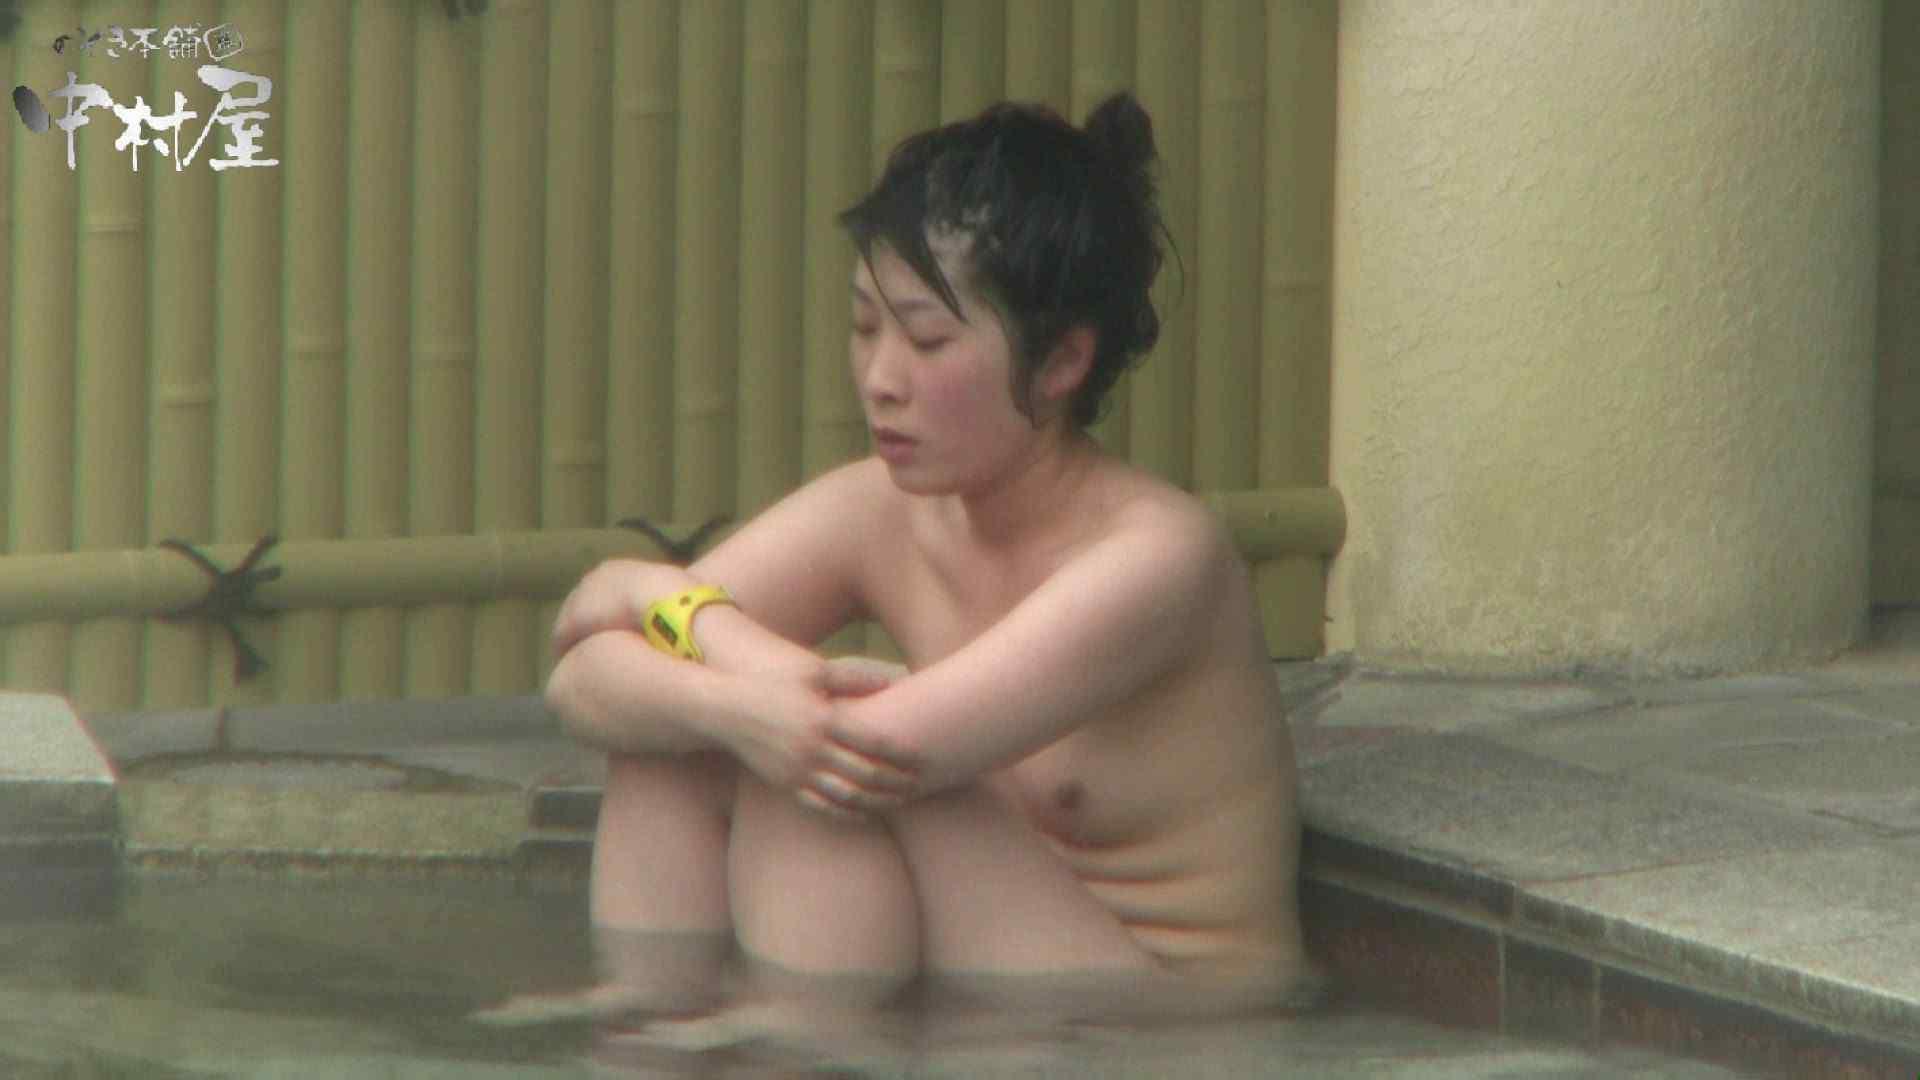 Aquaな露天風呂Vol.955 女体盗撮   OL女体  74連発 43